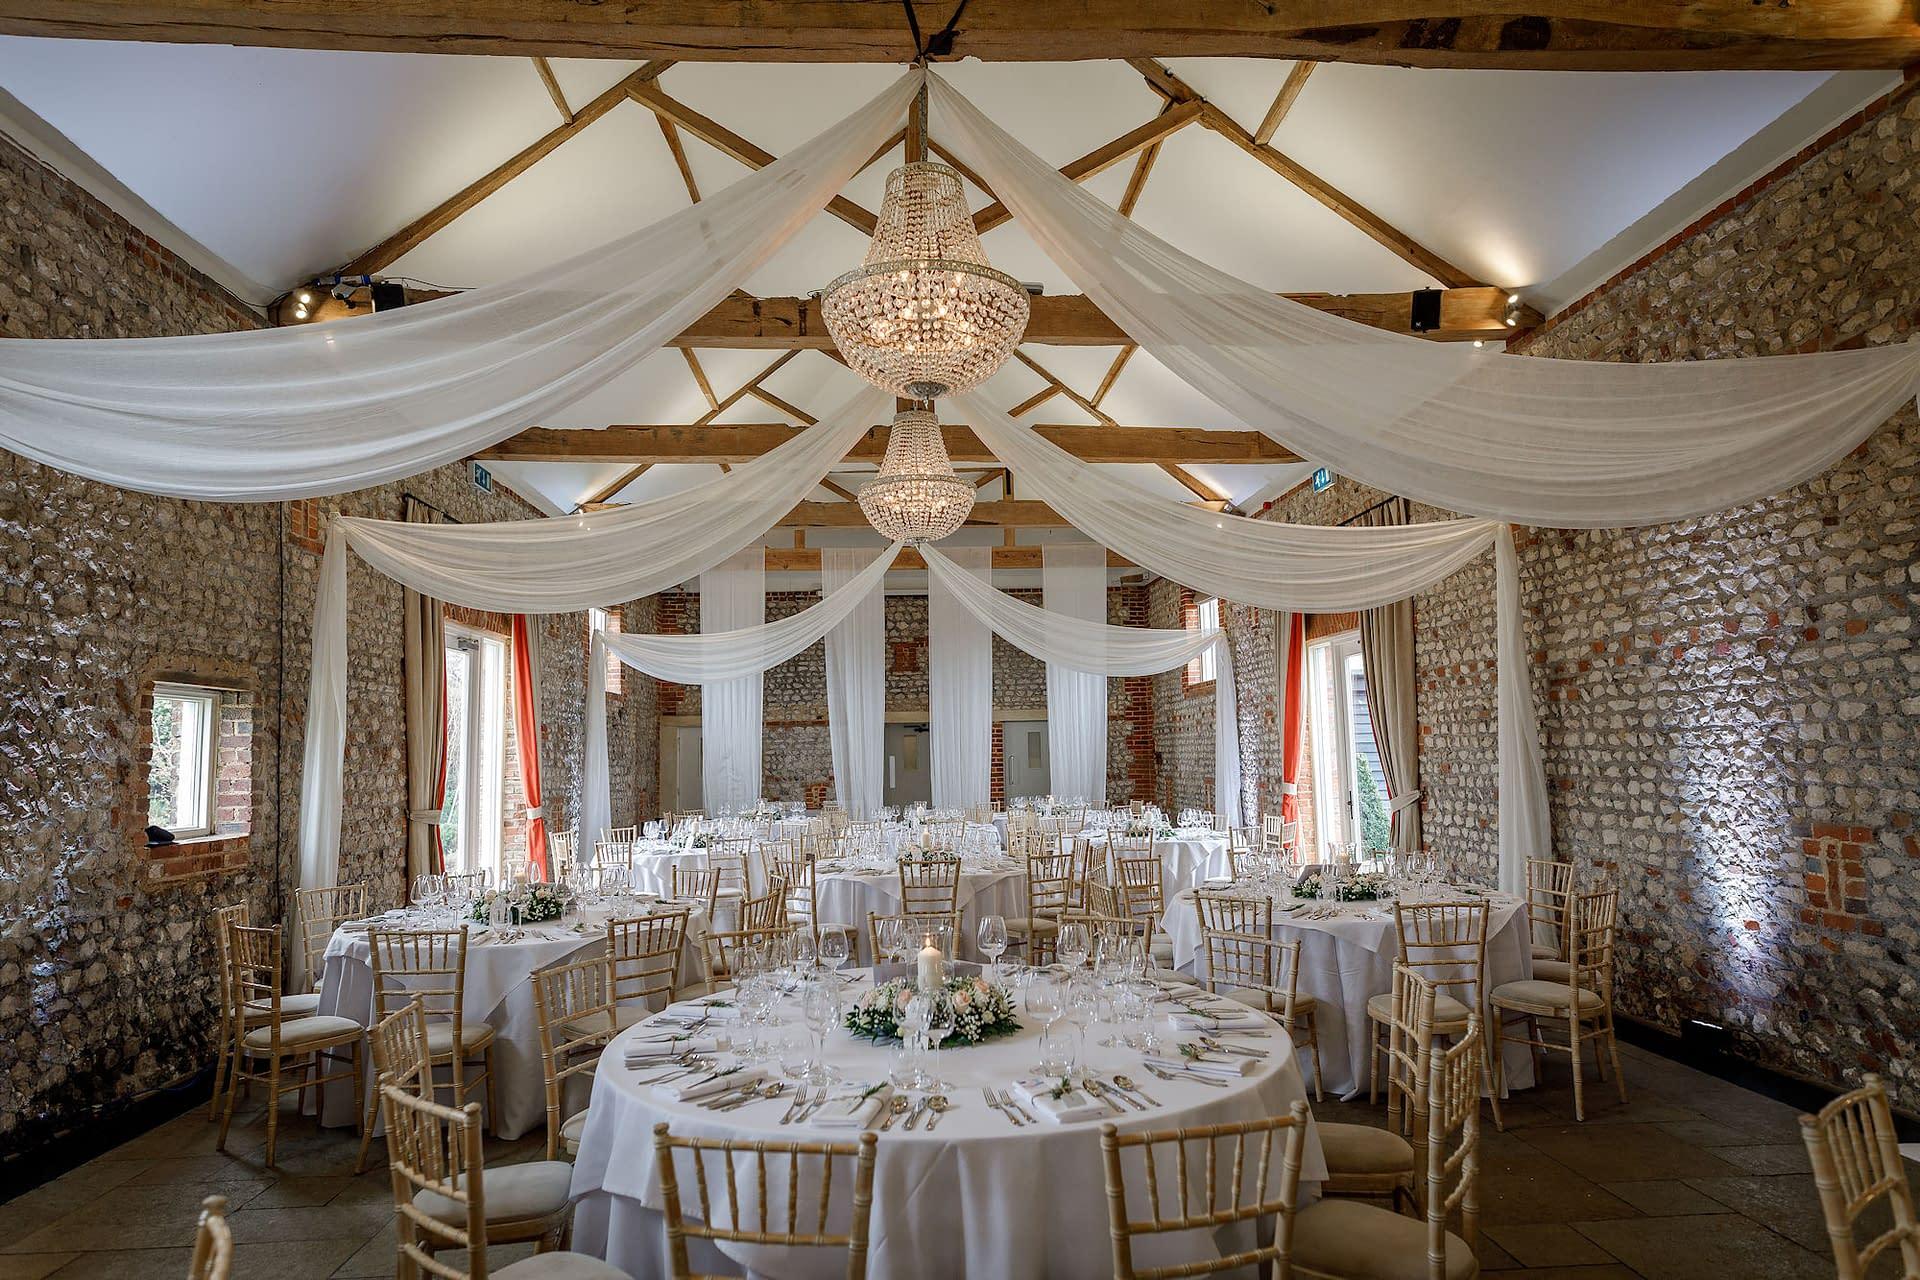 Muslin beam drapes with crystal swag chandeliers at Farbridge, UK wedding venue